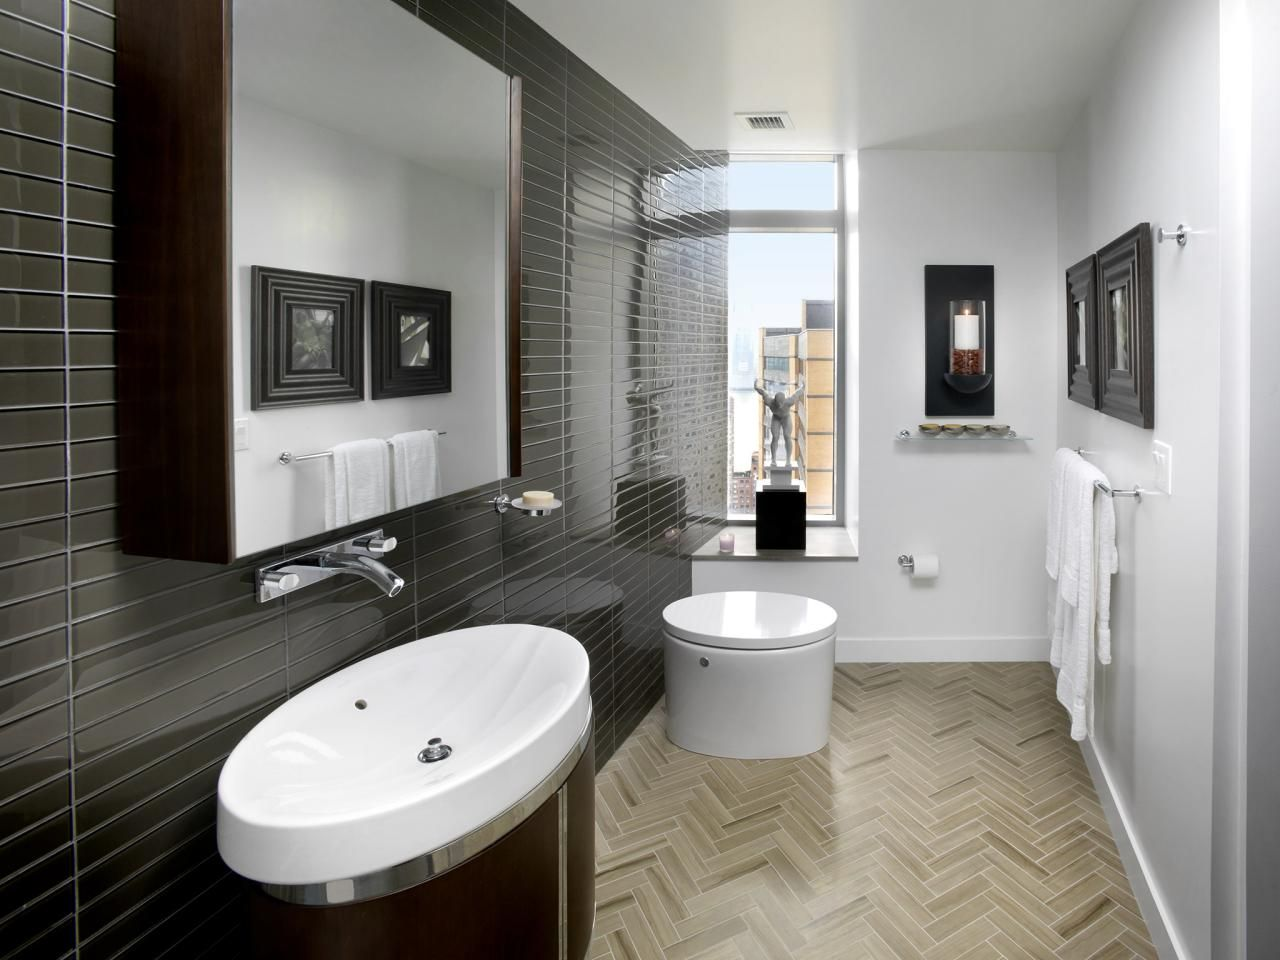 Small Bathtubs Ideas And Options Vern Yip And Floor Space - Bathtub options small bathroom for bathroom decor ideas